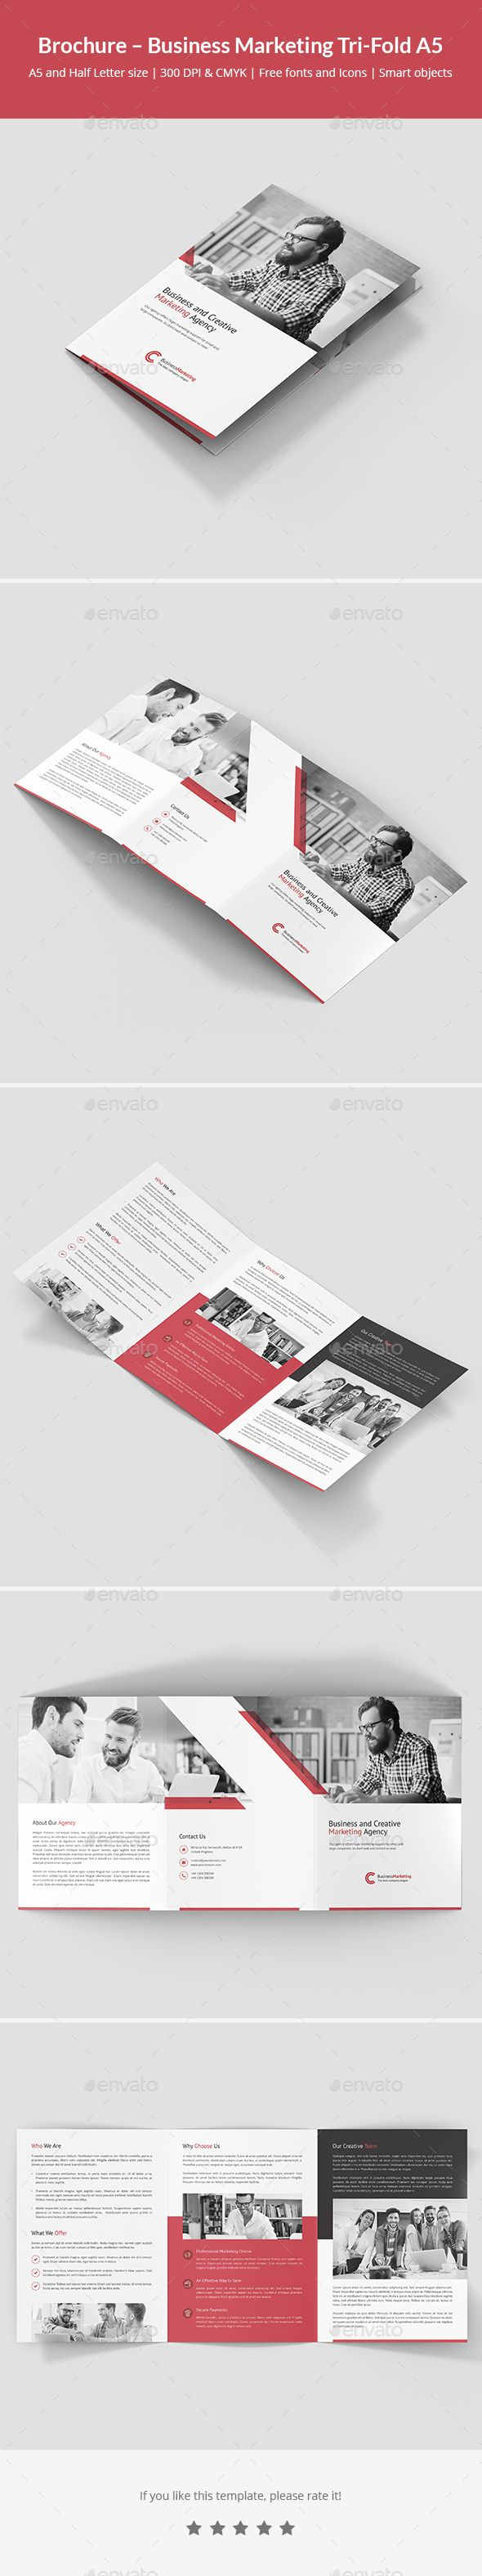 Brochure  Business Marketing TriFold A  Business Marketing